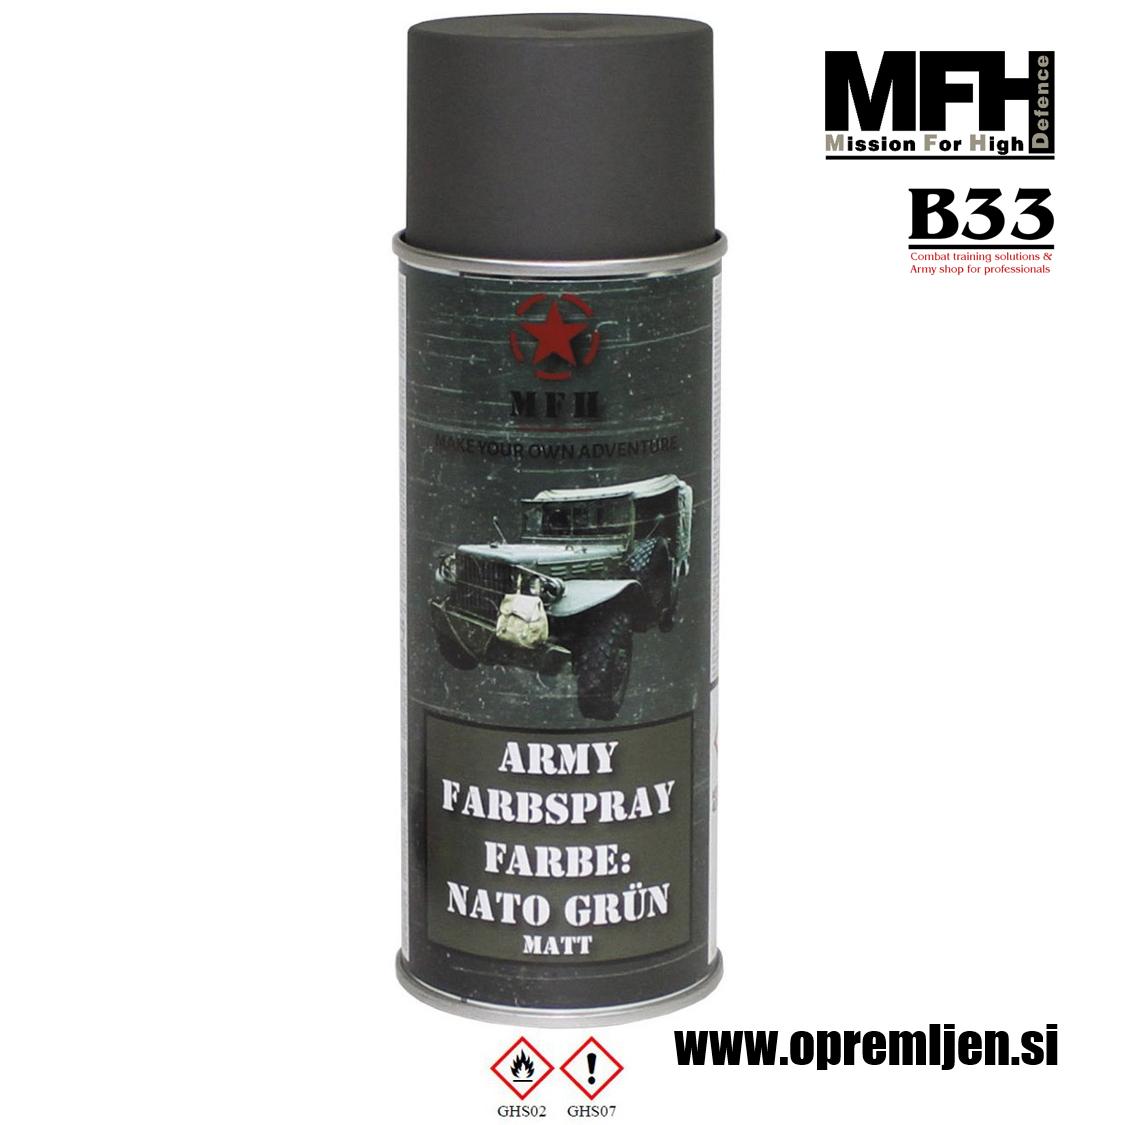 Vojaška barva sprej zelena NATO GREEN 400ml MFH - Max Fuchs by B33 army shop at www.opremljen.si